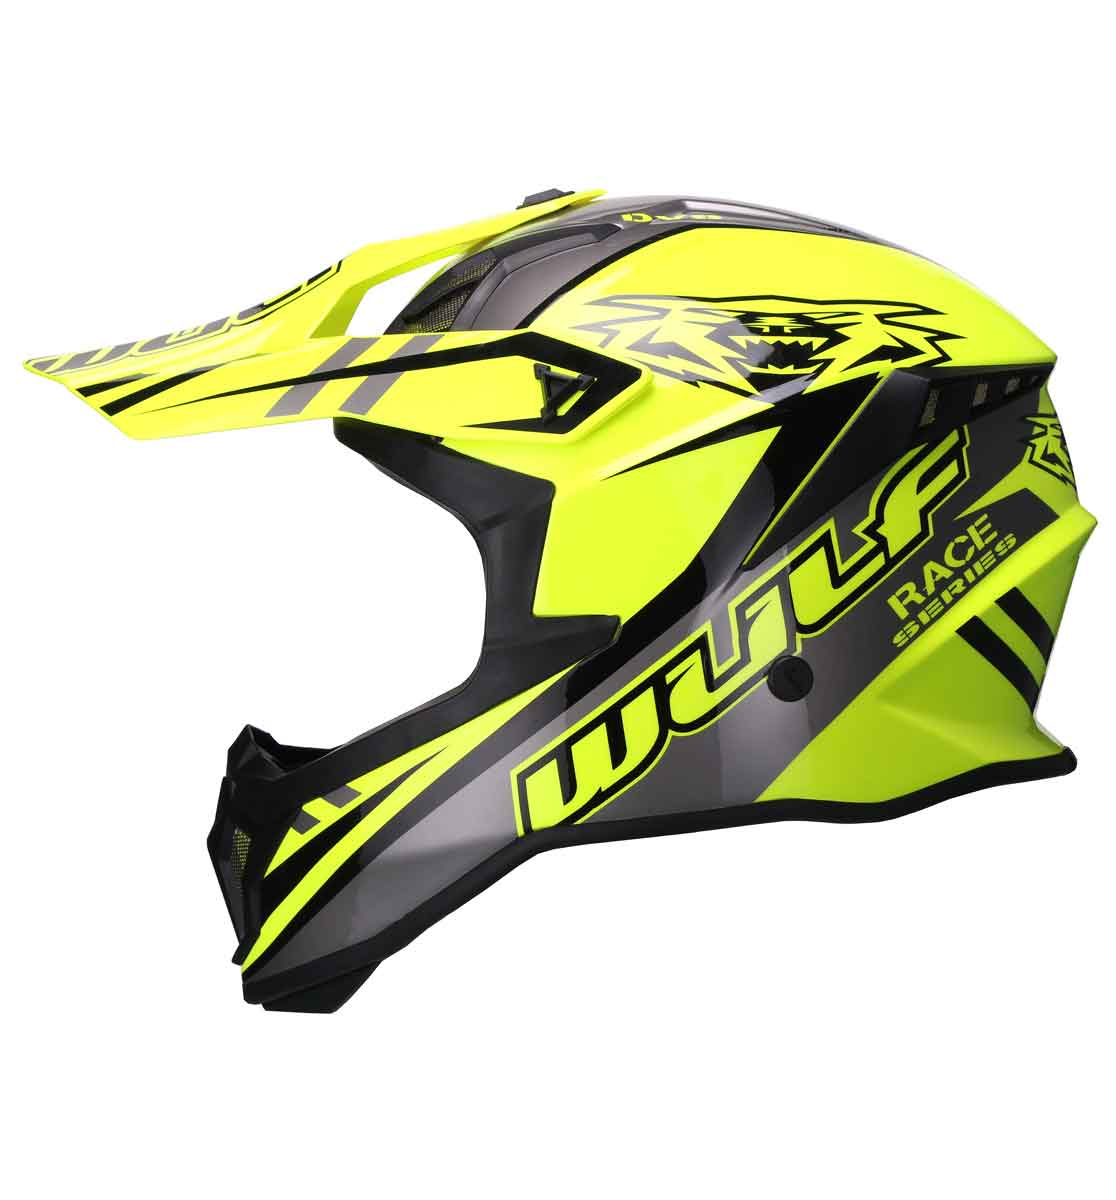 Wulfsport Race Series Helmet | Yellow | Medium (57-58cm)